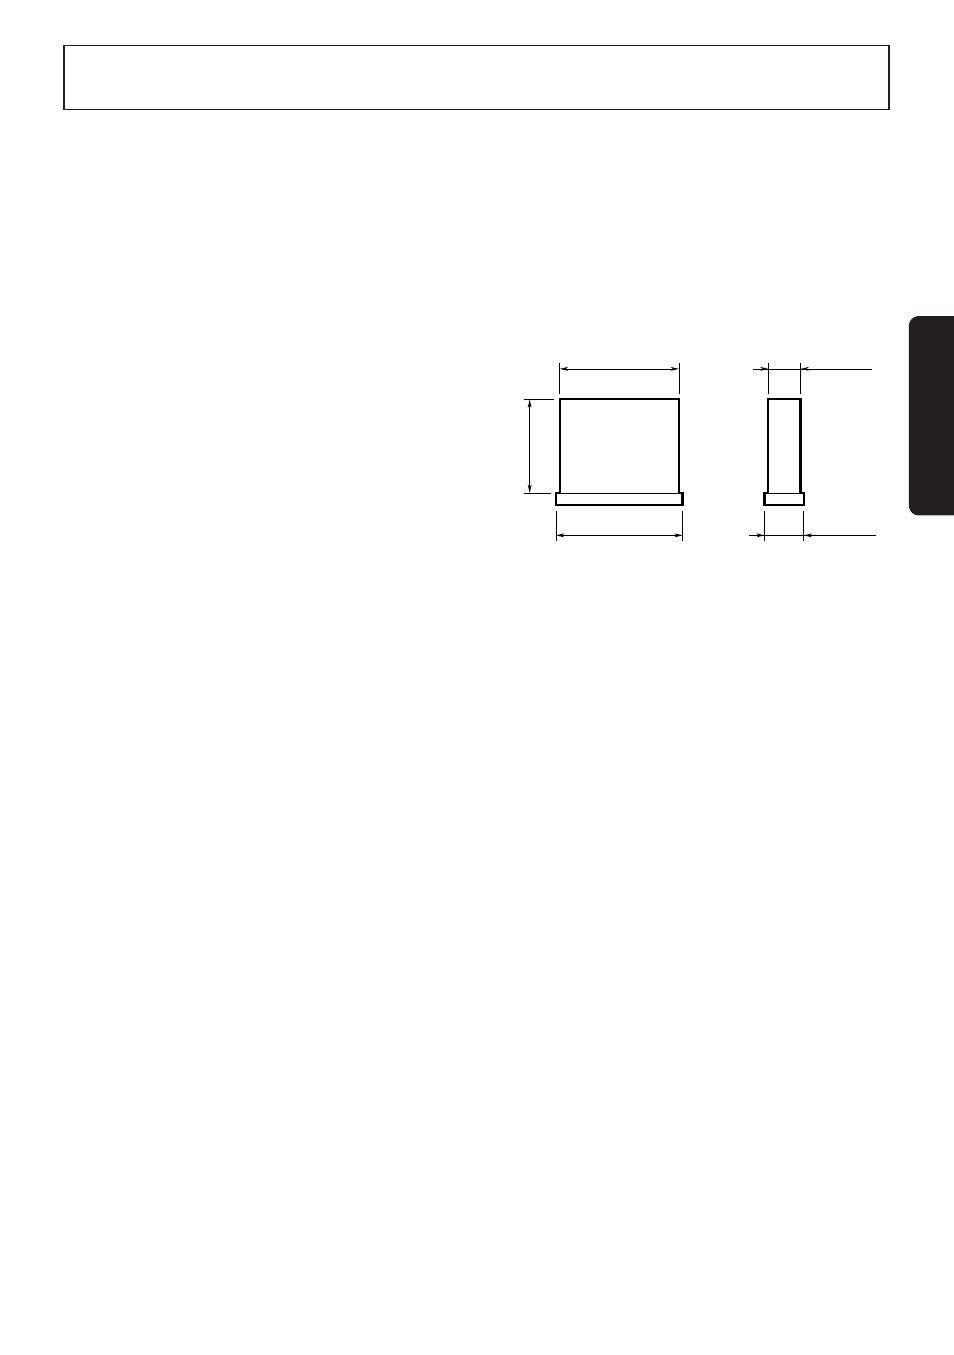 specifications 13 english fm tuner clarion db125 user manual rh manualsdir com